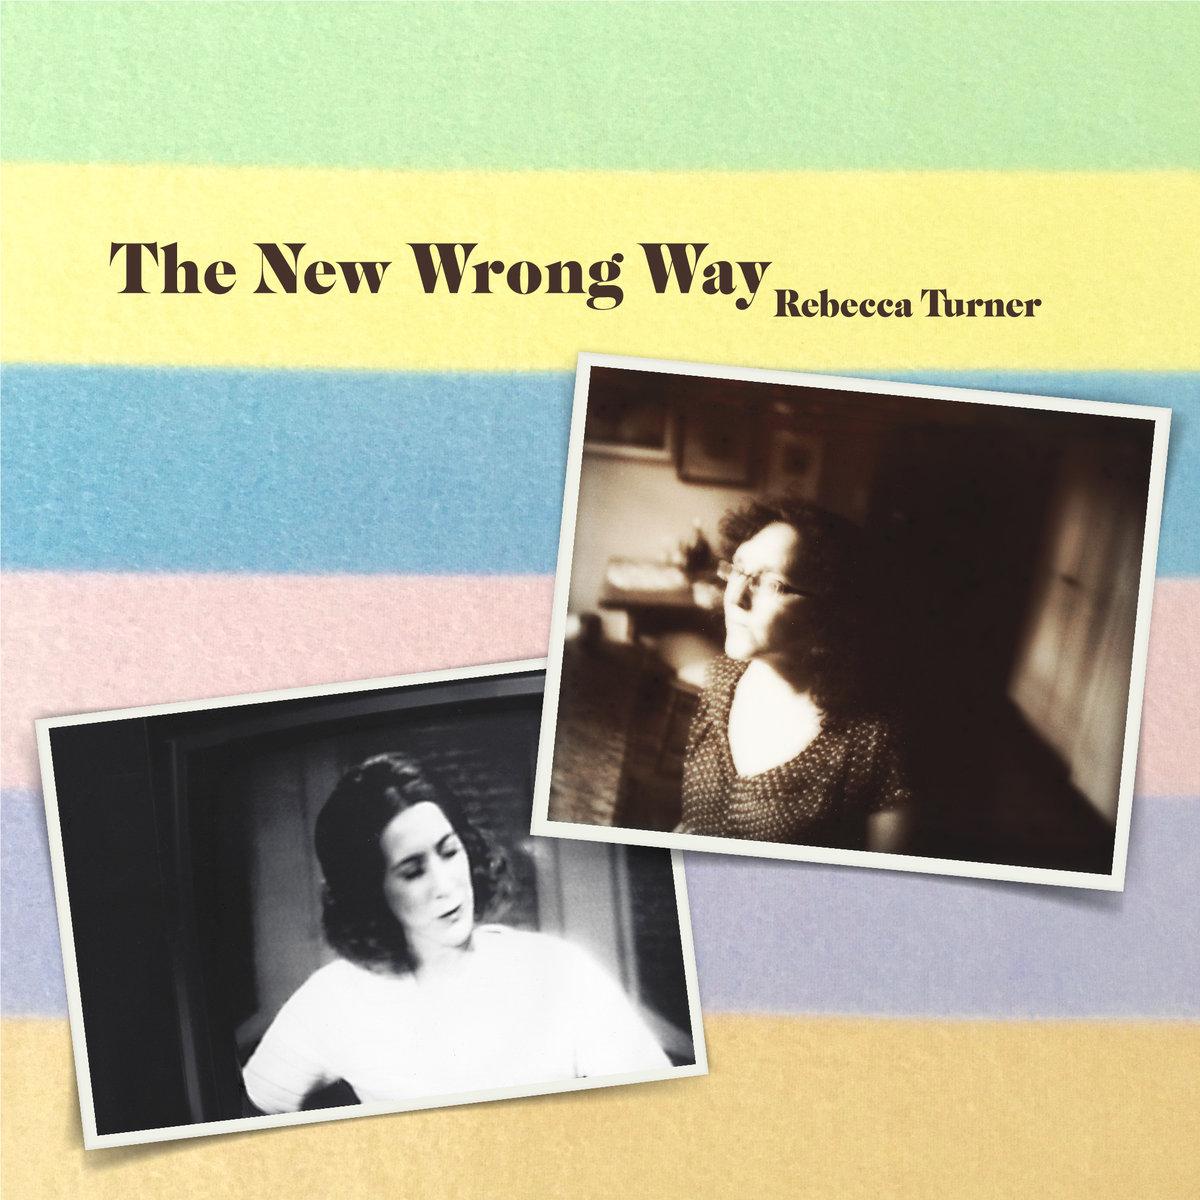 The New Wrong Way